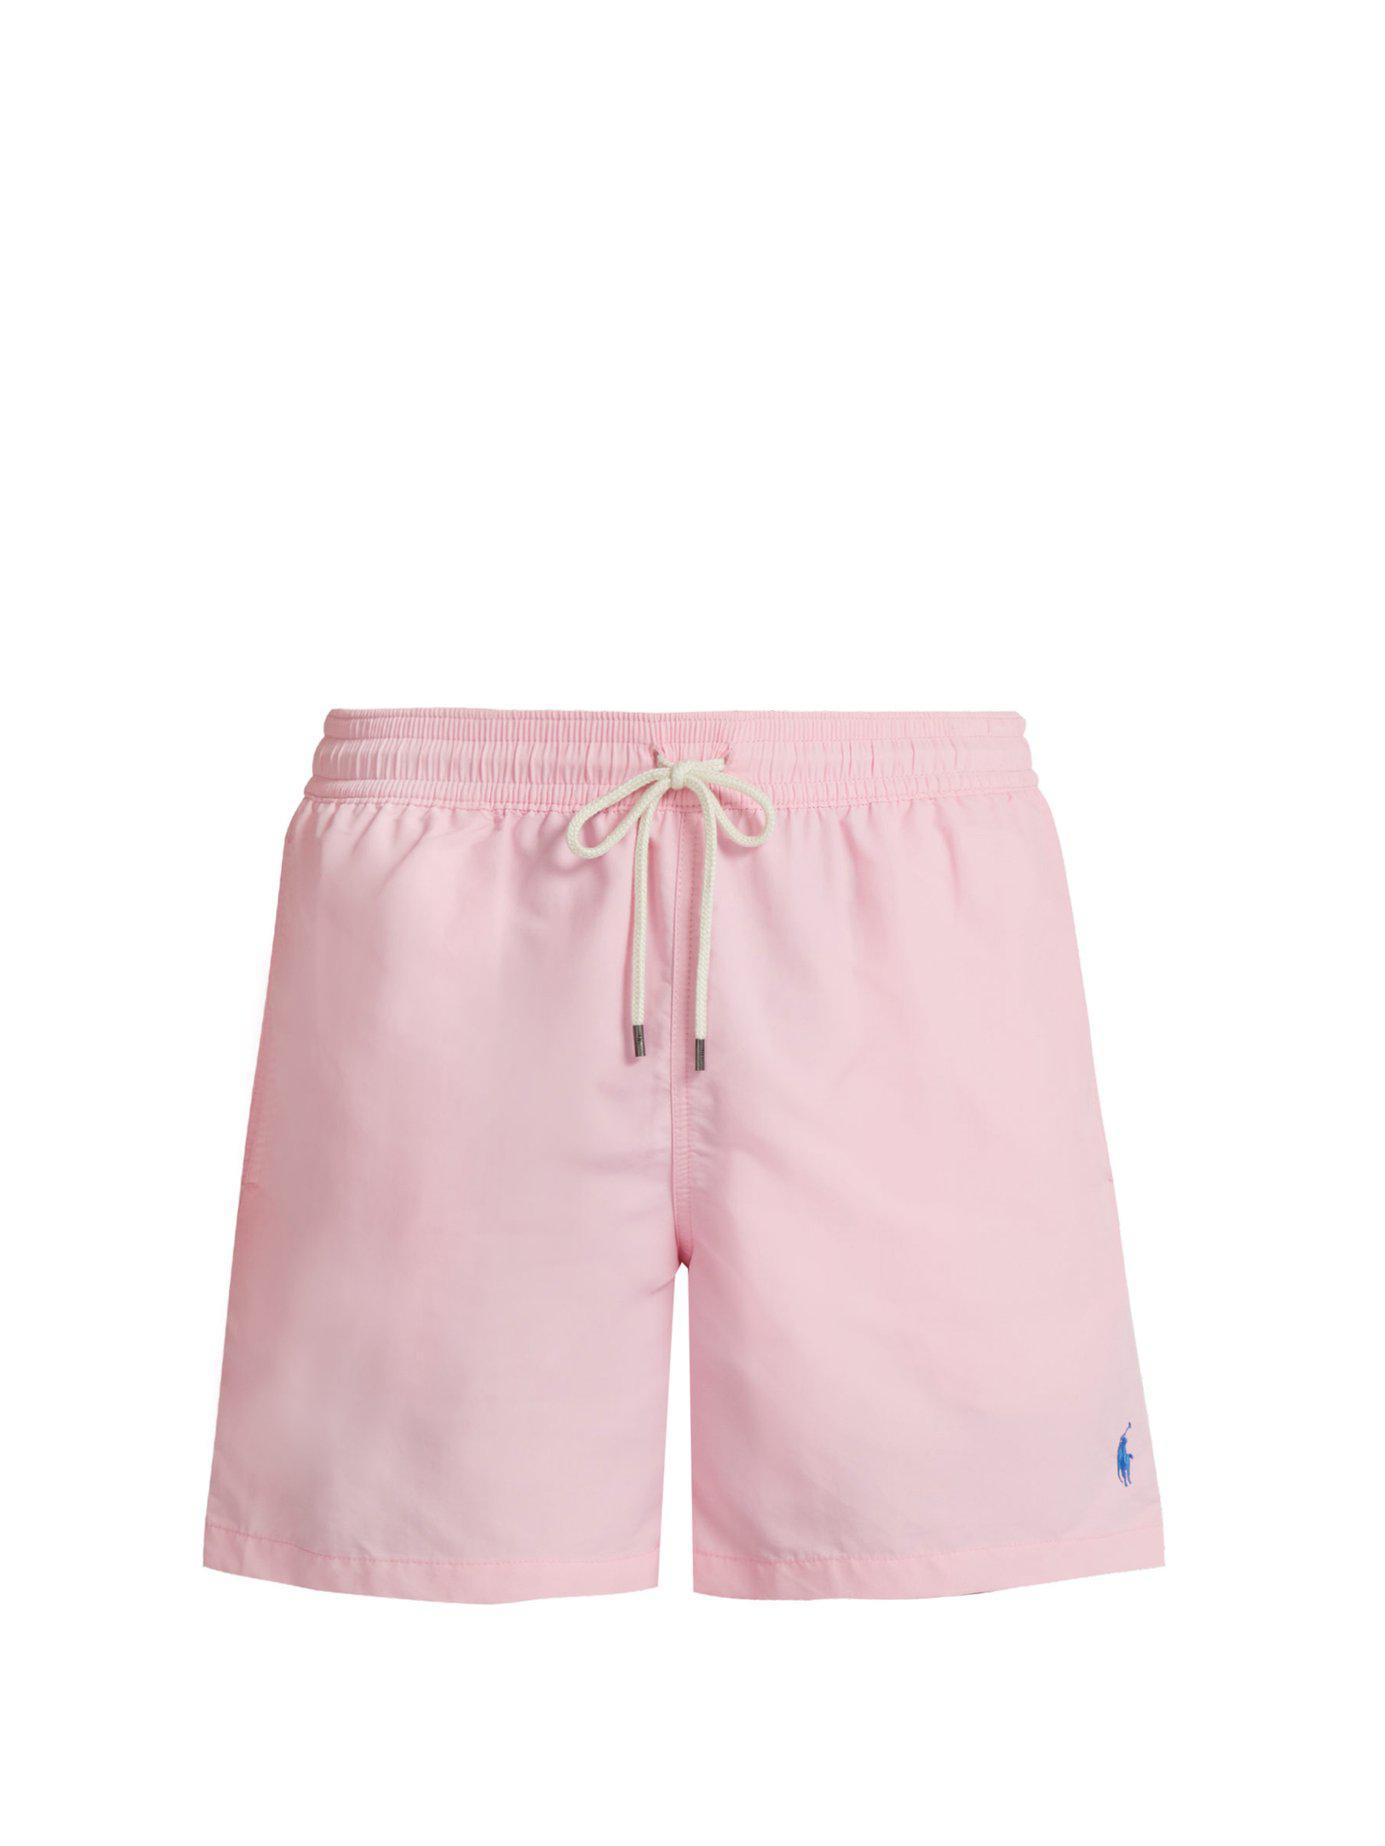 ecdd347613631 Lyst - Polo Ralph Lauren Traveller Swim Shorts in Pink for Men ...